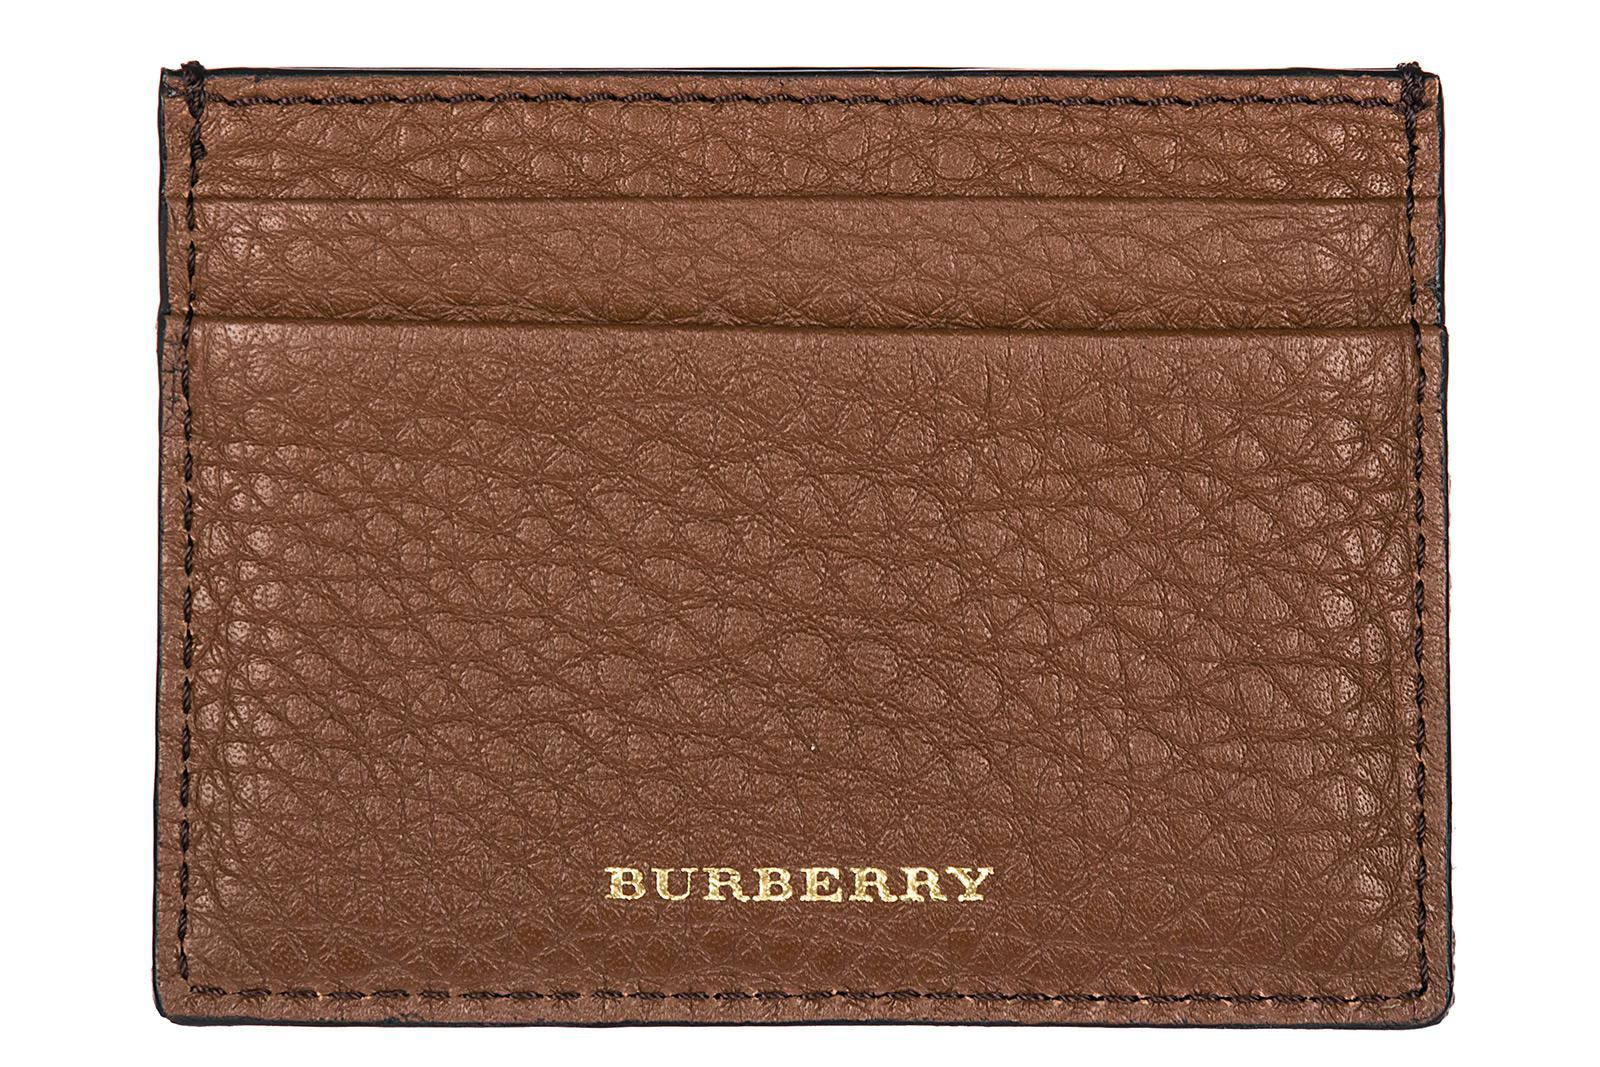 Burberry Men's Genuine Leather Credit Card Case Holder Wallet Sandon In Brown